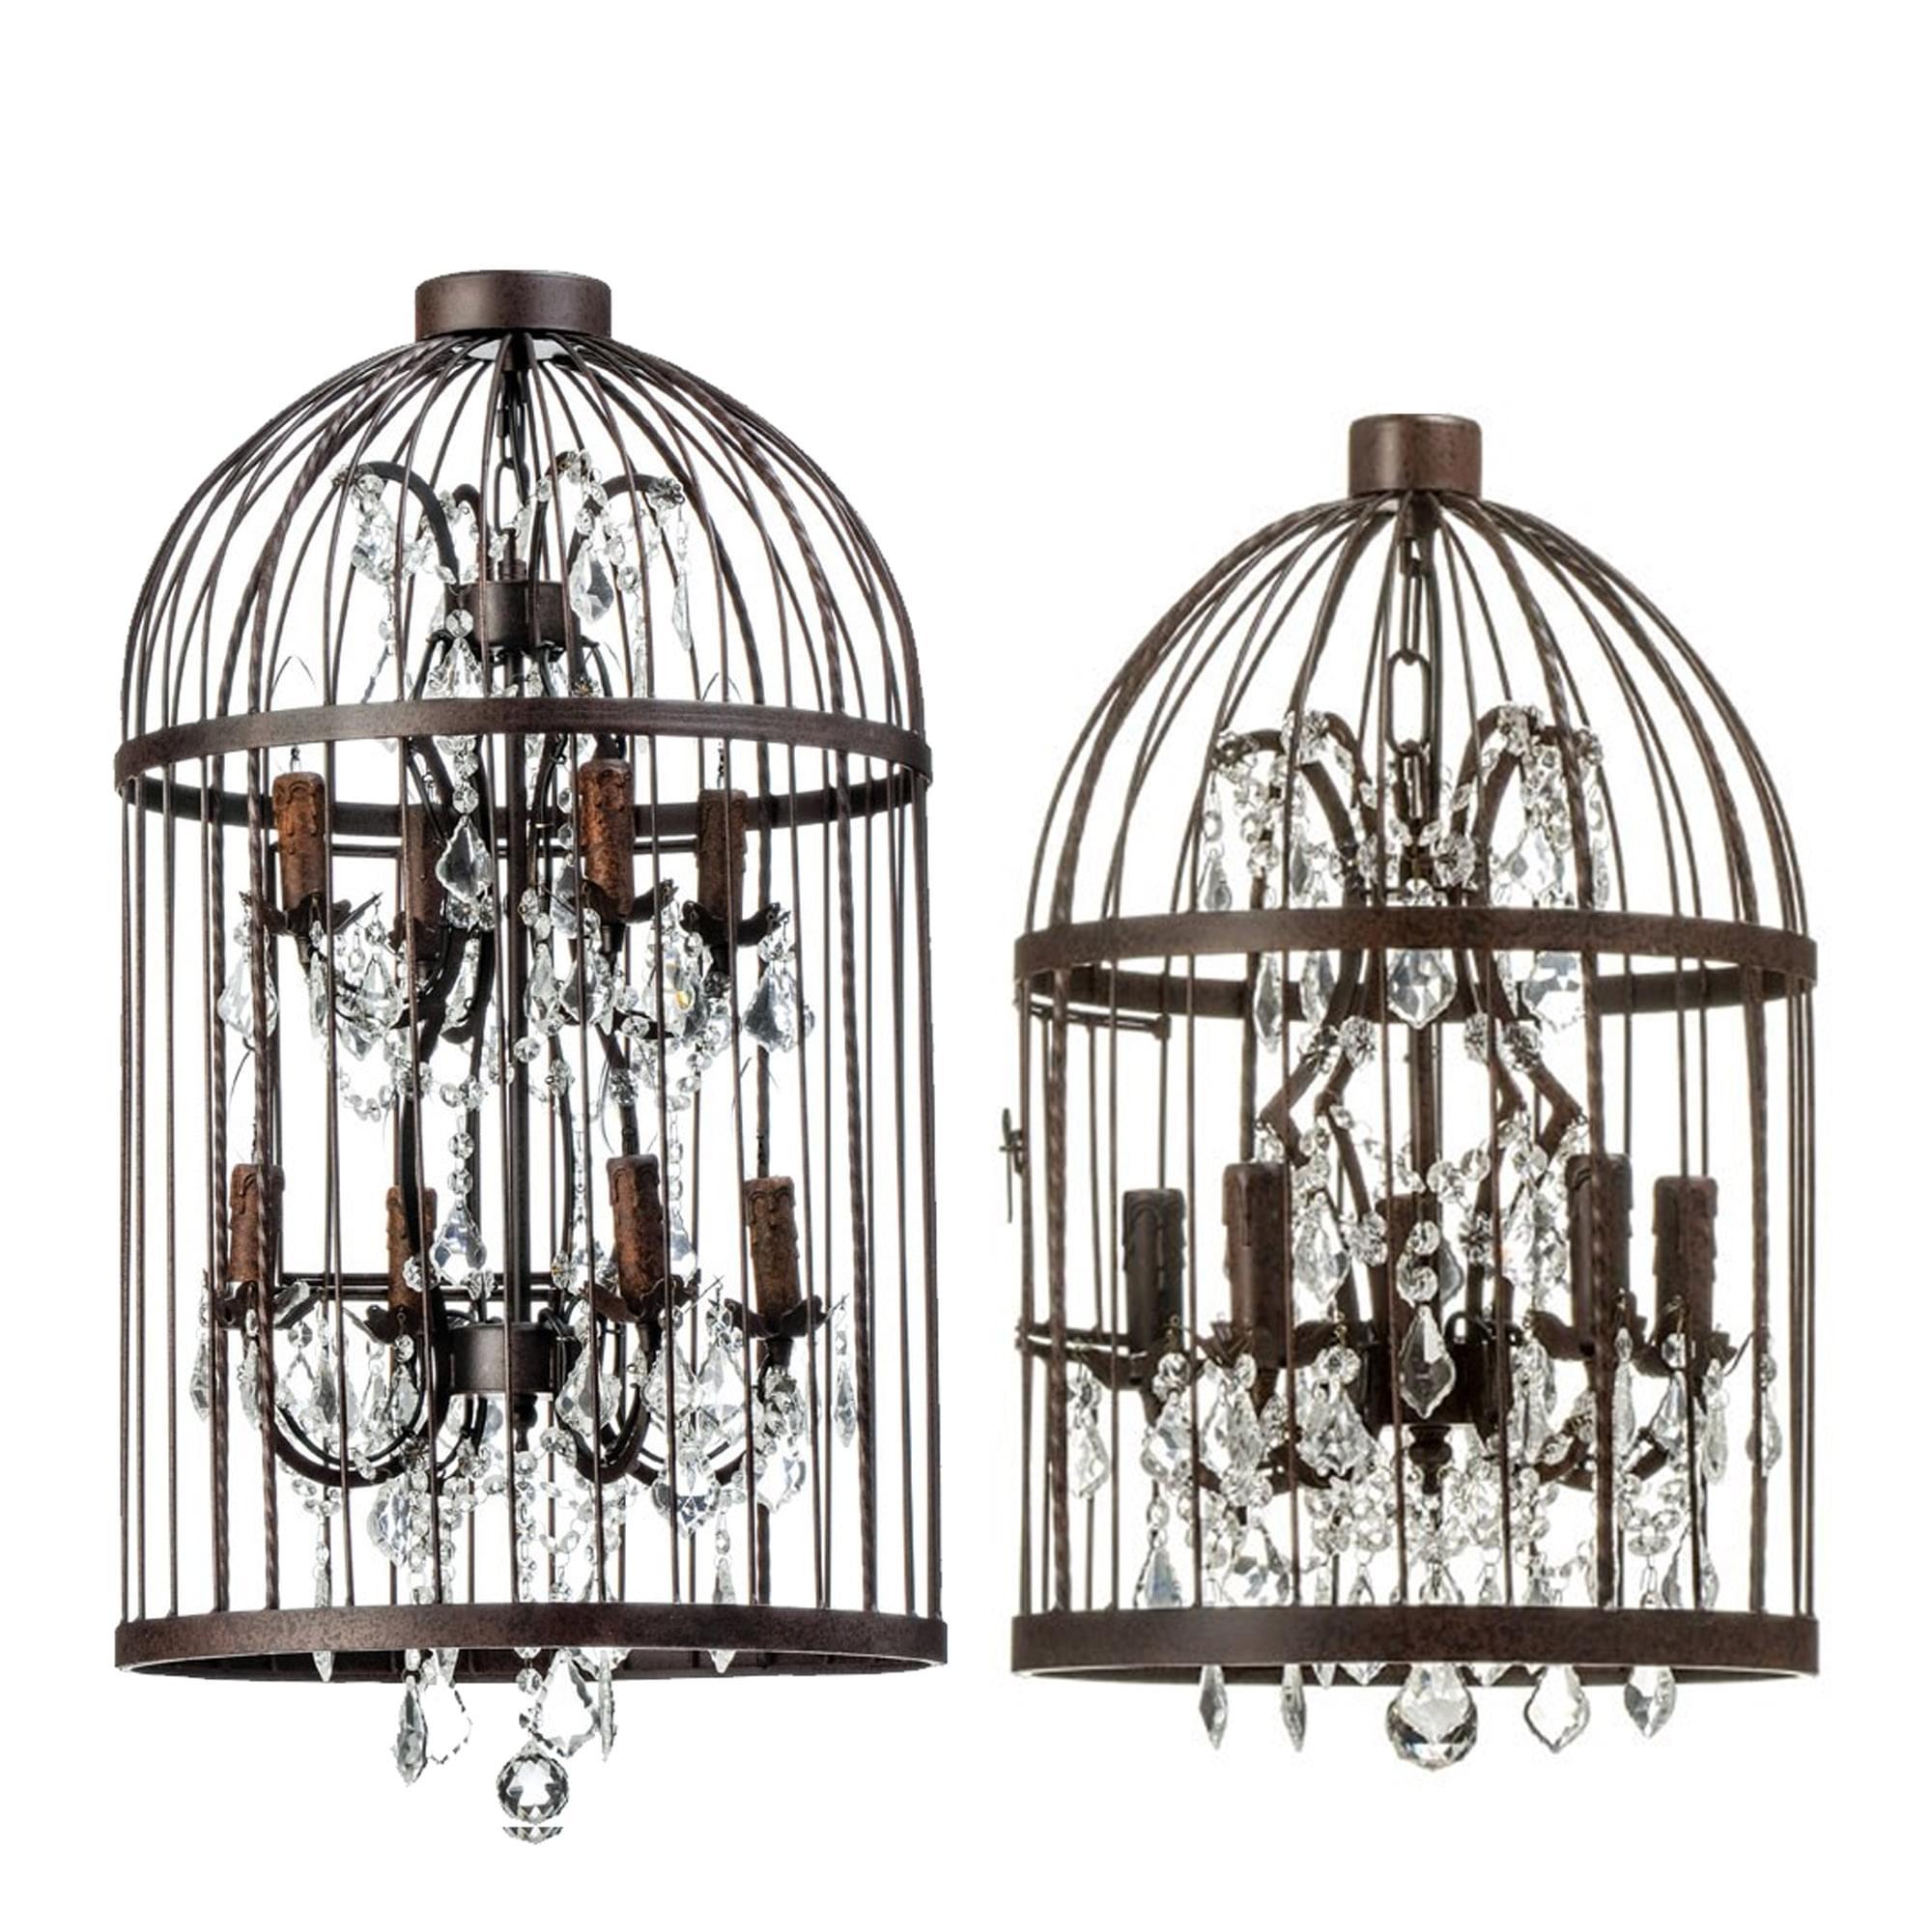 Art Deco Birdcage Pendant Light Industrial Pendant Lighting Uk